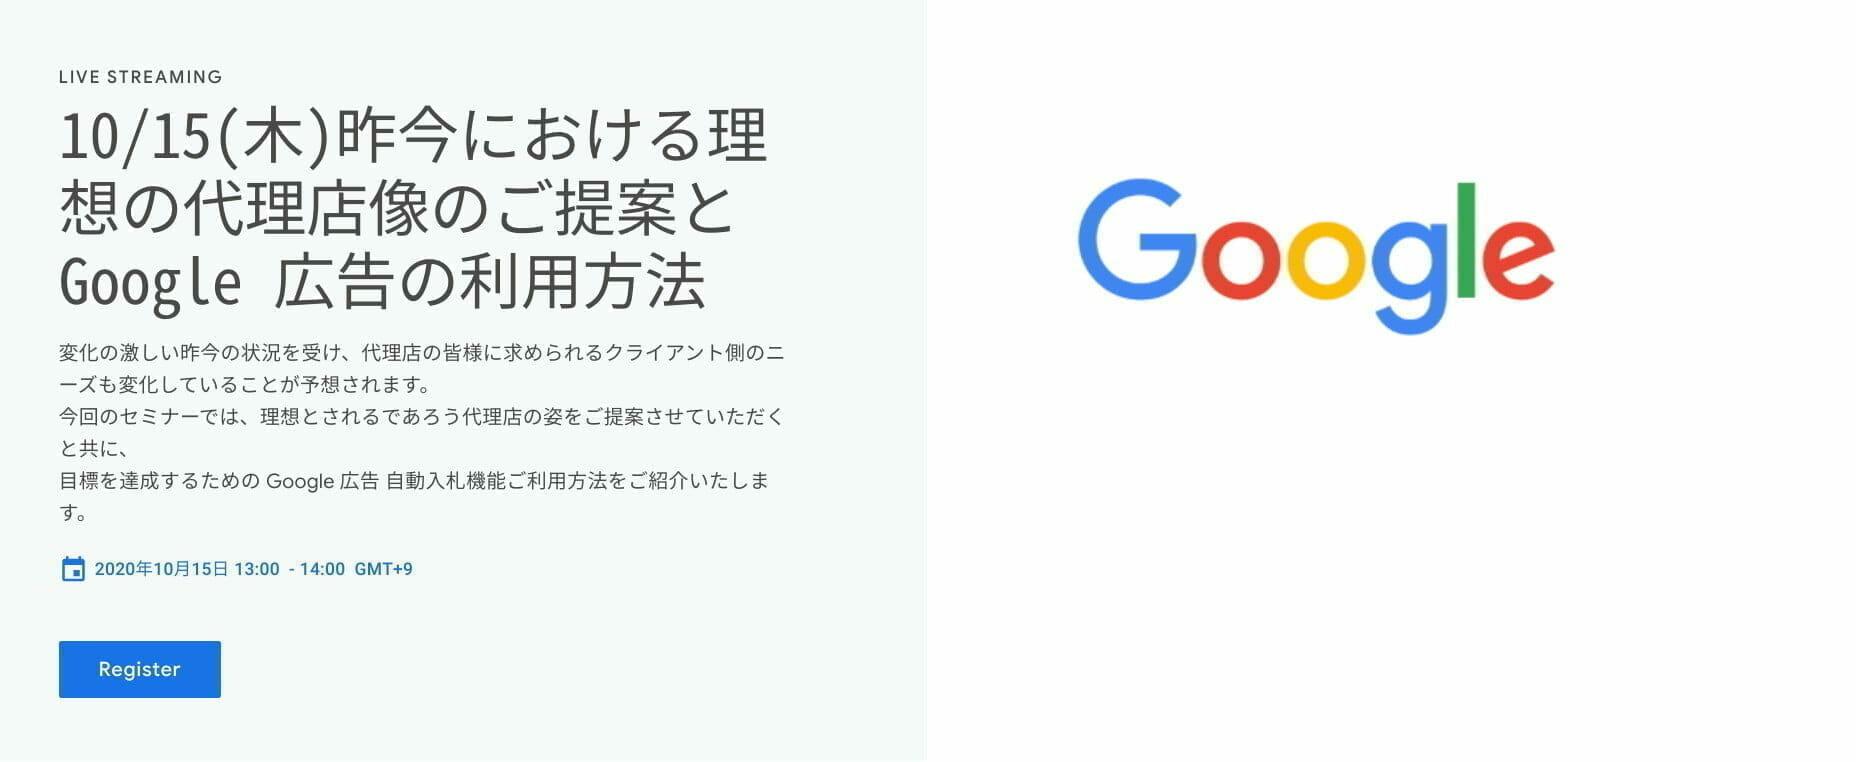 [Google 広告] 昨今における理想の代理店像のご提案と Google 広告の利用方法